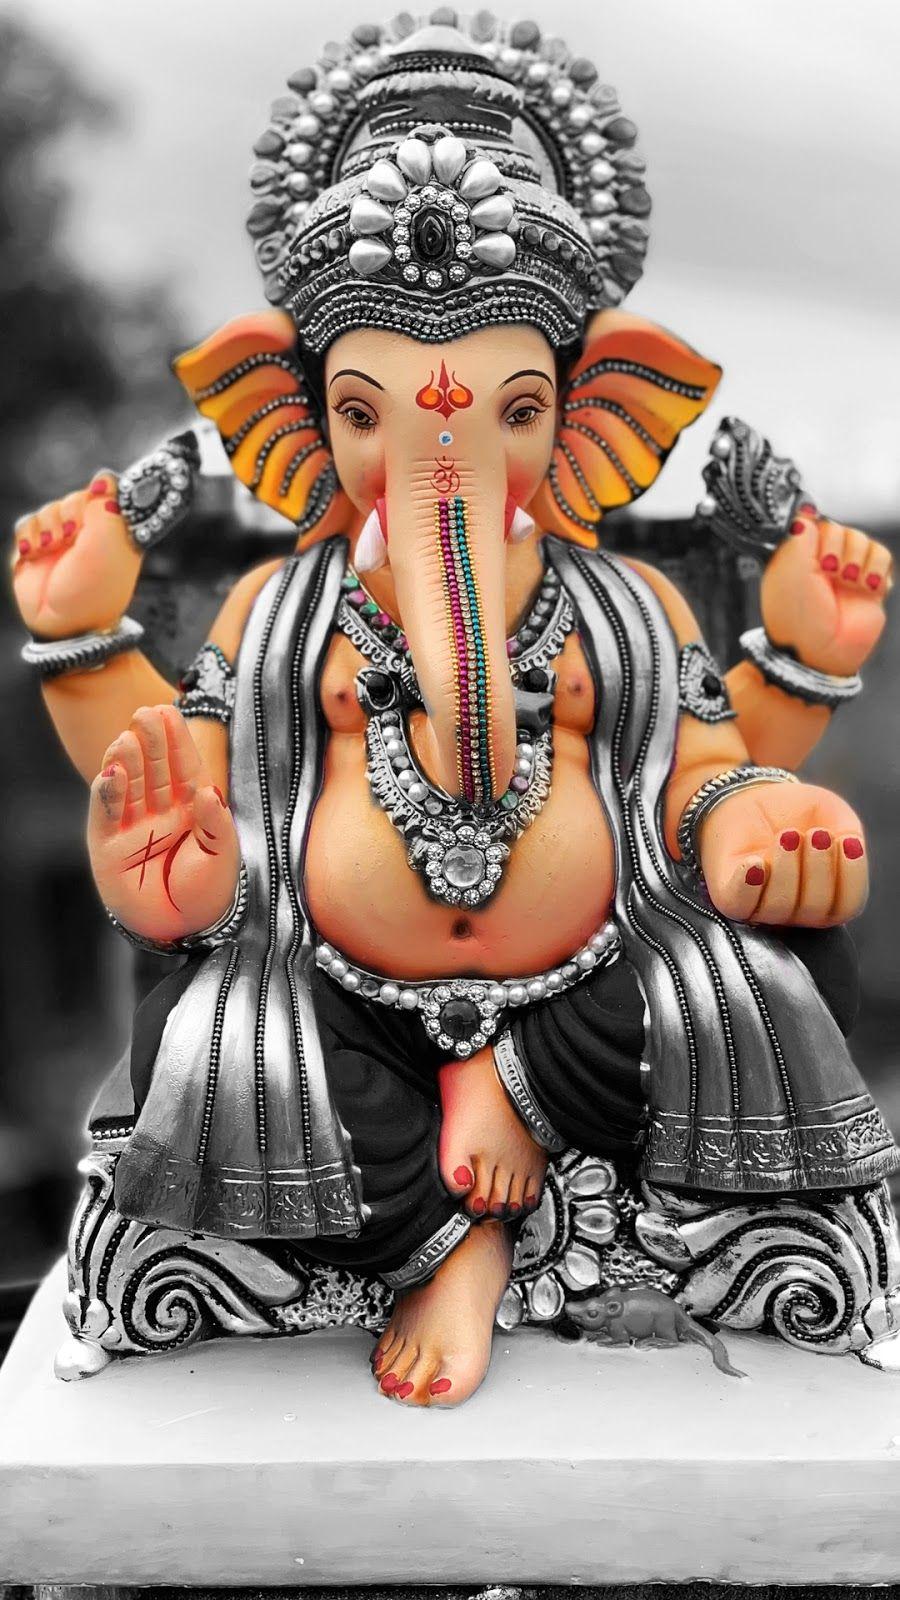 Lord Ganesha Edited Mobile Wallpaper Indian God Shivaji Maharaj Hd Wallpaper Mahadev Hd Wallpaper Lord Murugan Wallpapers